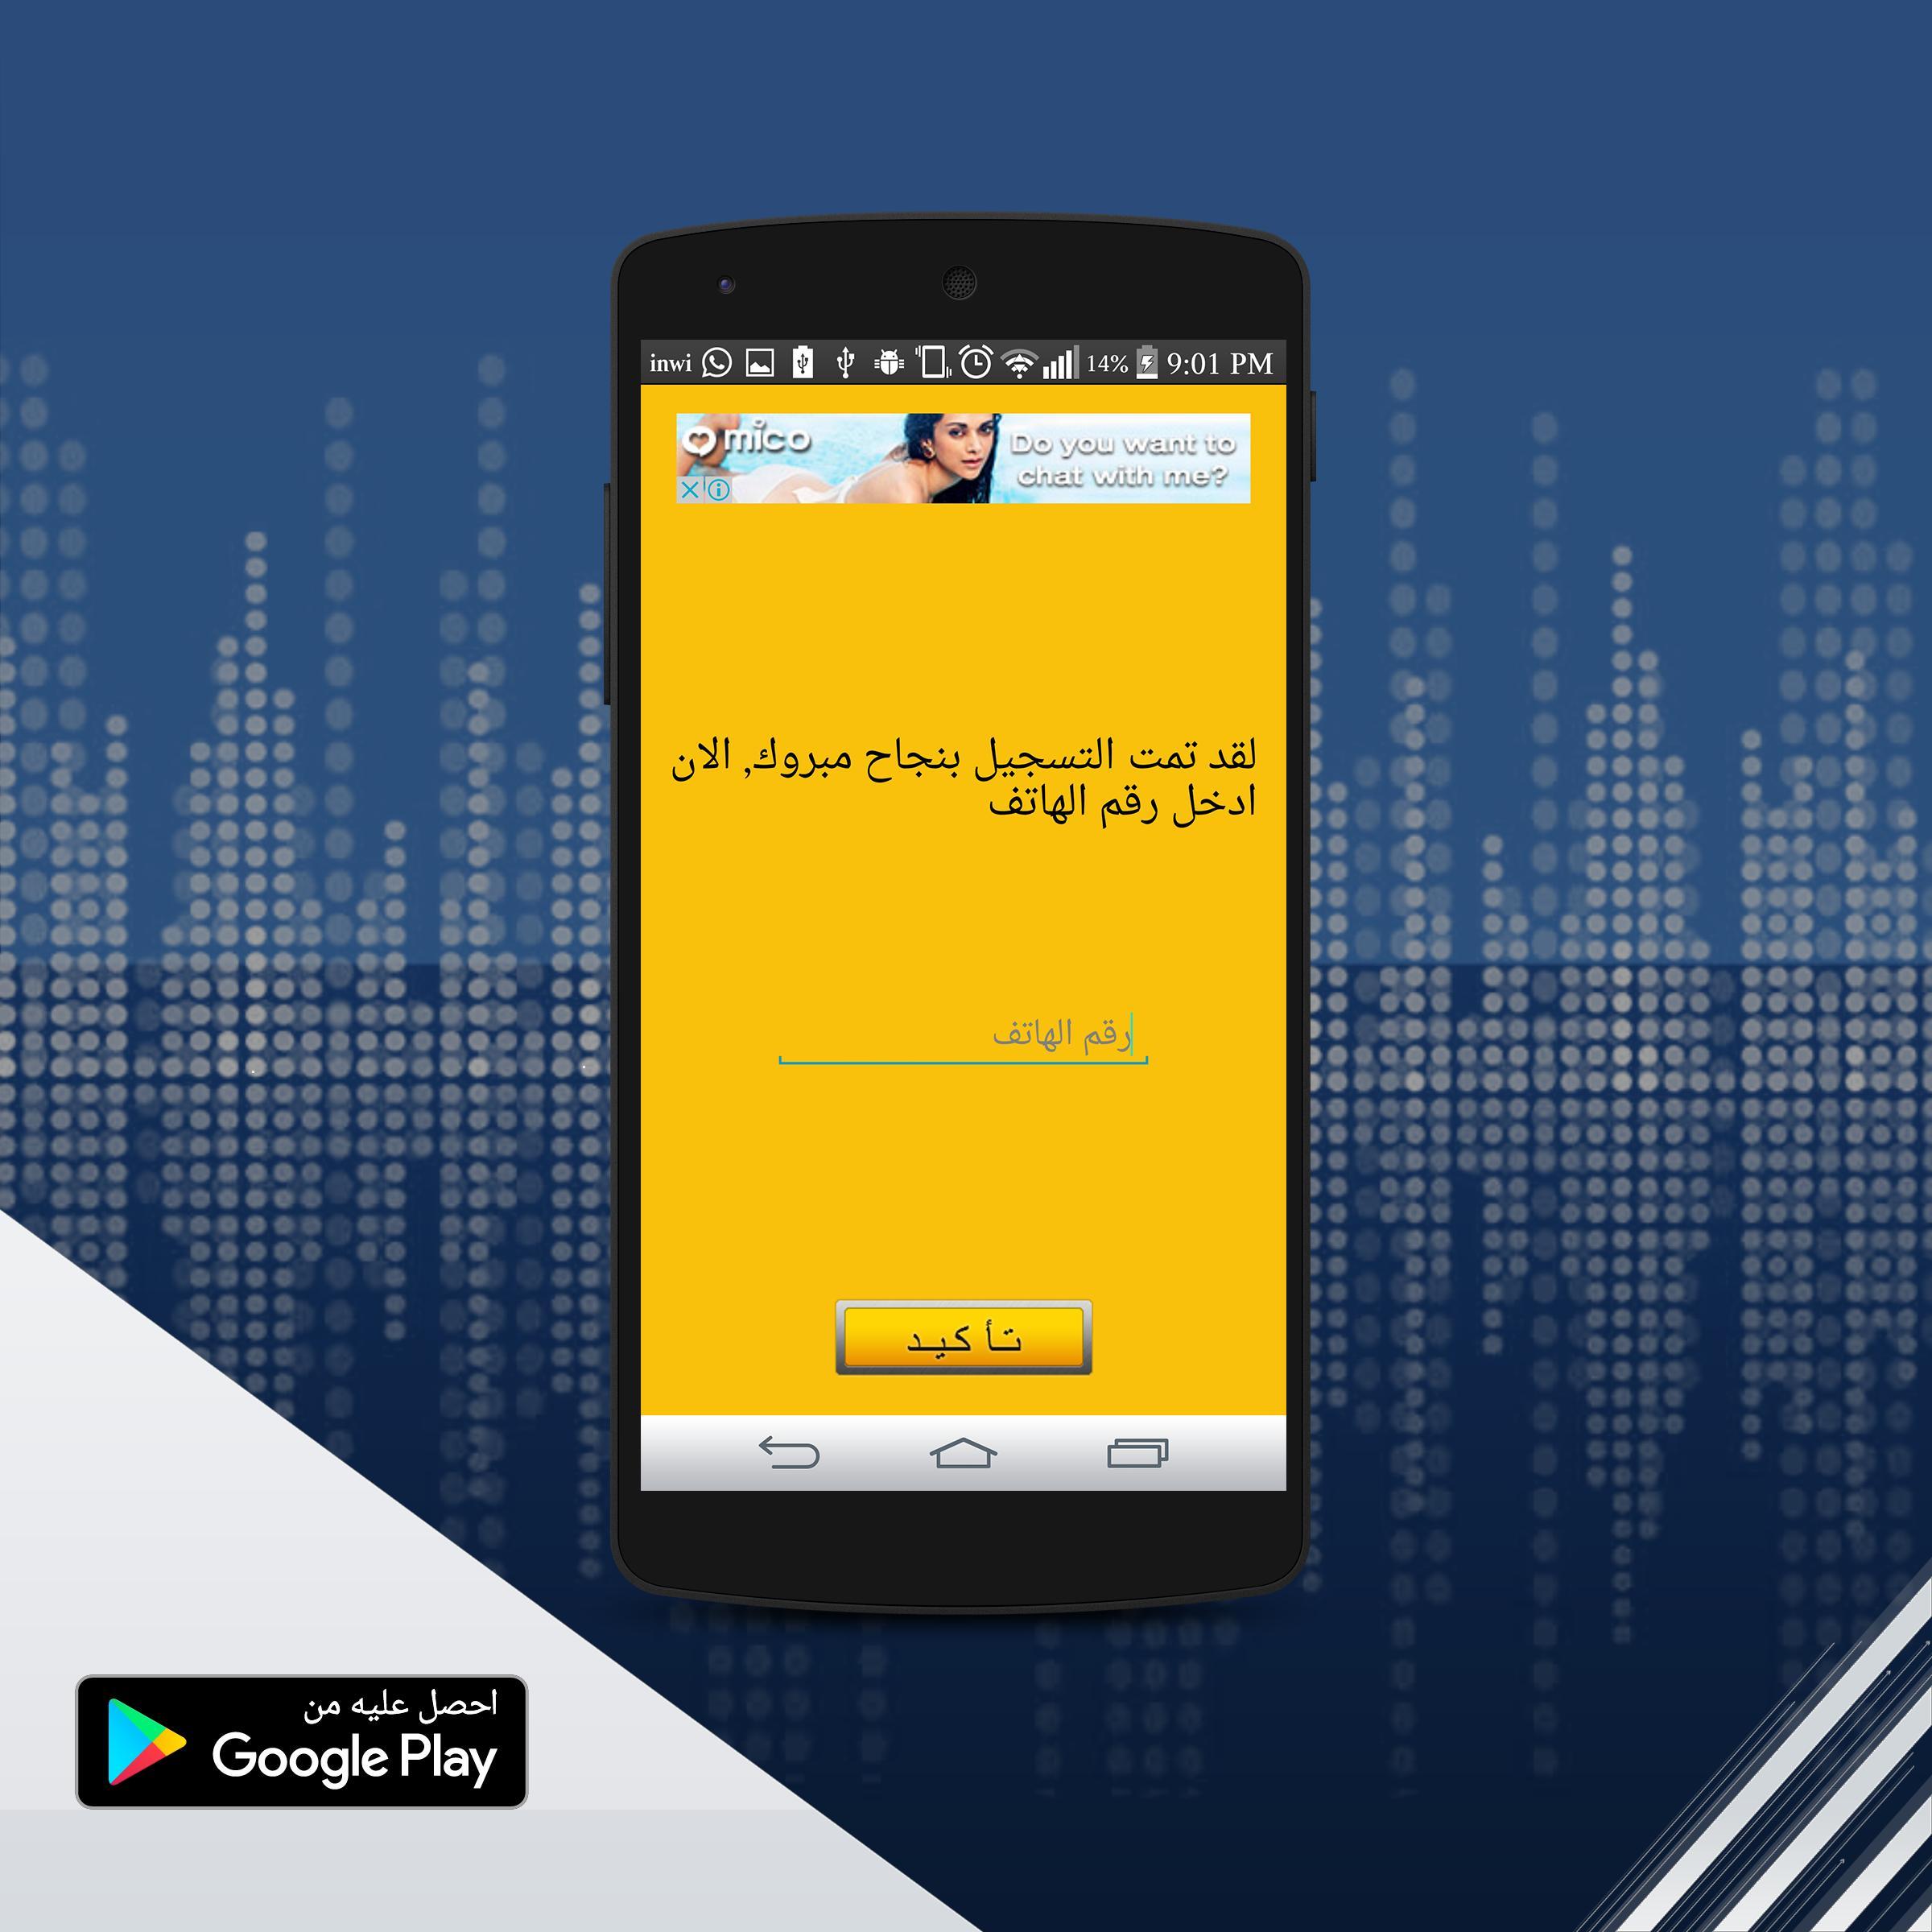 Gps تحديد مكان المتصل Prank For Android Apk Download